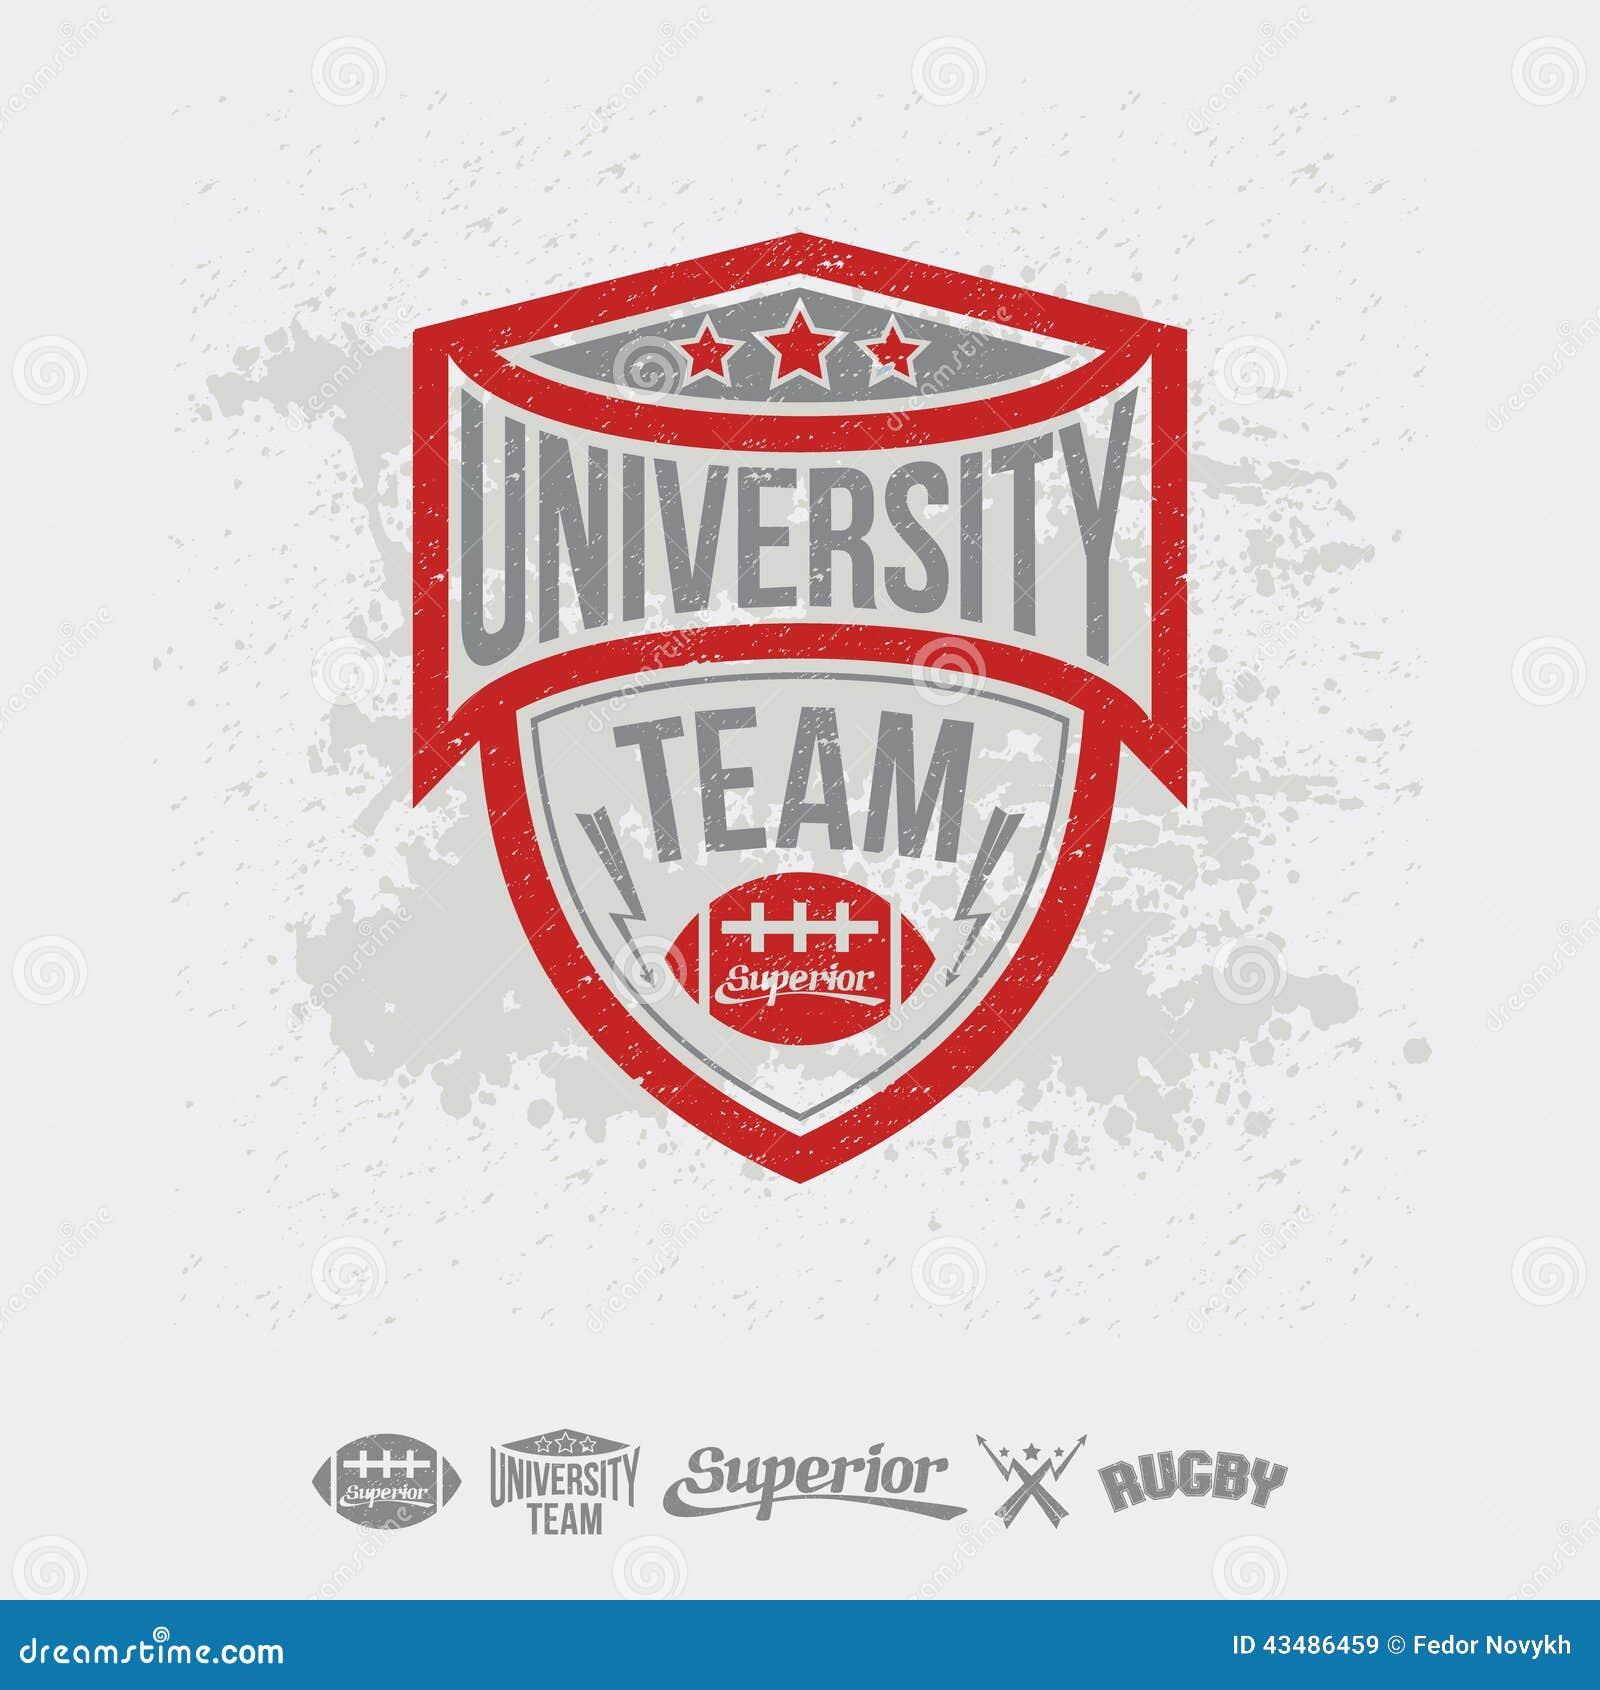 Shirt design elements - Rugby Emblem University Team And Design Elements Royalty Free Stock Images